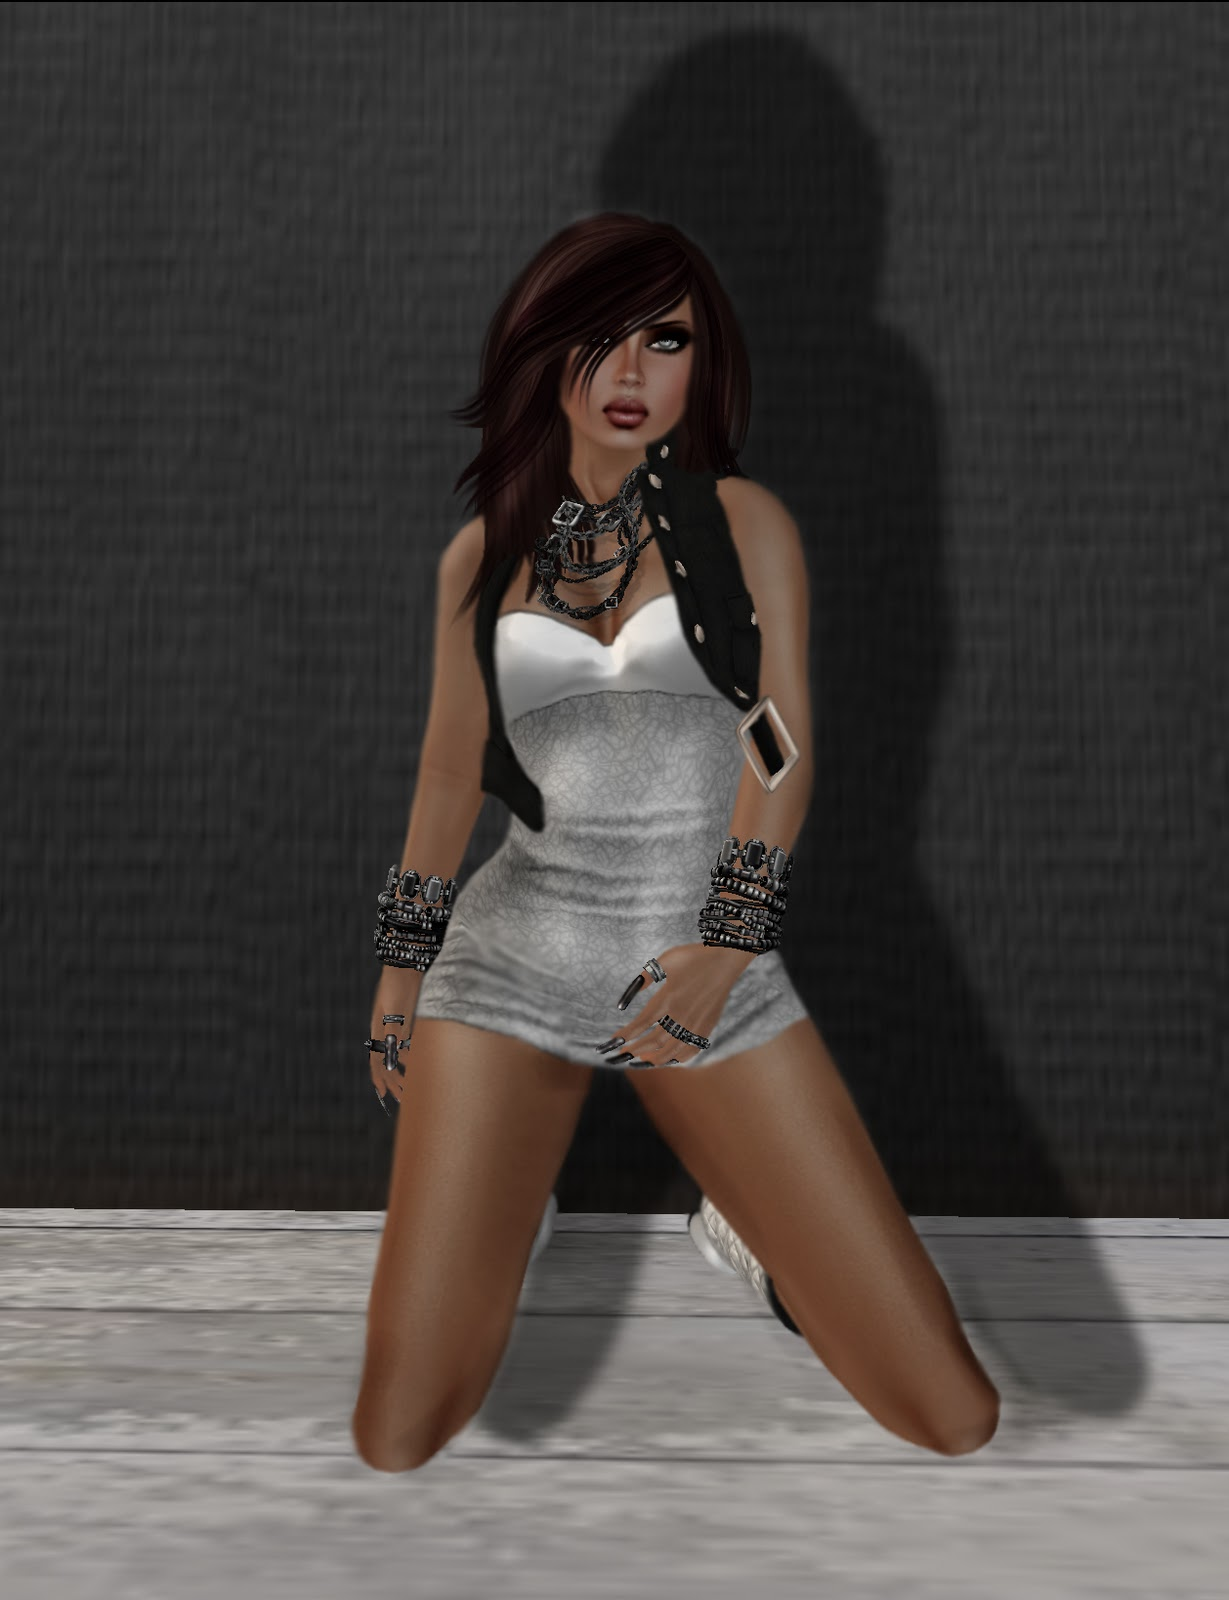 http://2.bp.blogspot.com/_JRSXaSs-7Mo/TTbGZrZ4u8I/AAAAAAAAADY/WbF9QFK0vlk/s1600/41.jpg